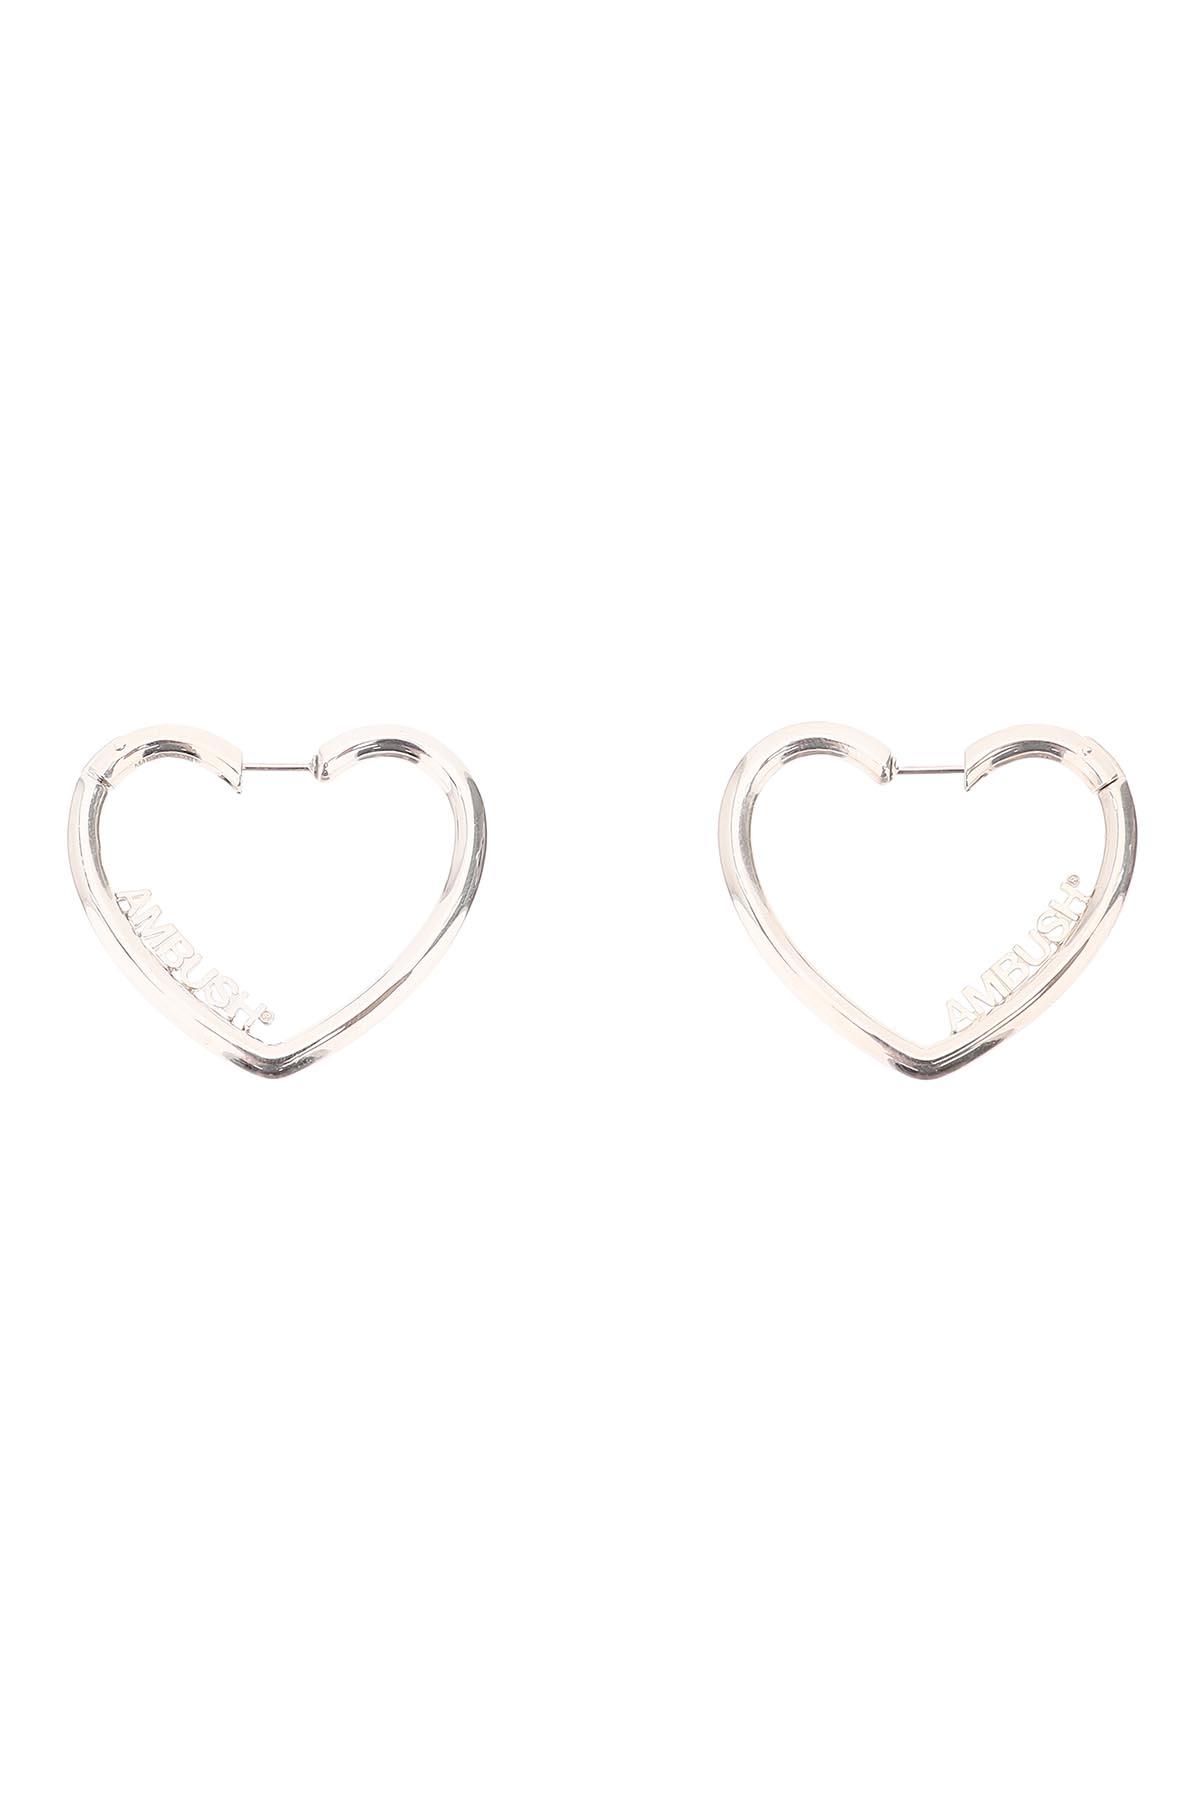 AMBUSH LADIES SMALL HEART HOOP EARRINGS OS Silver